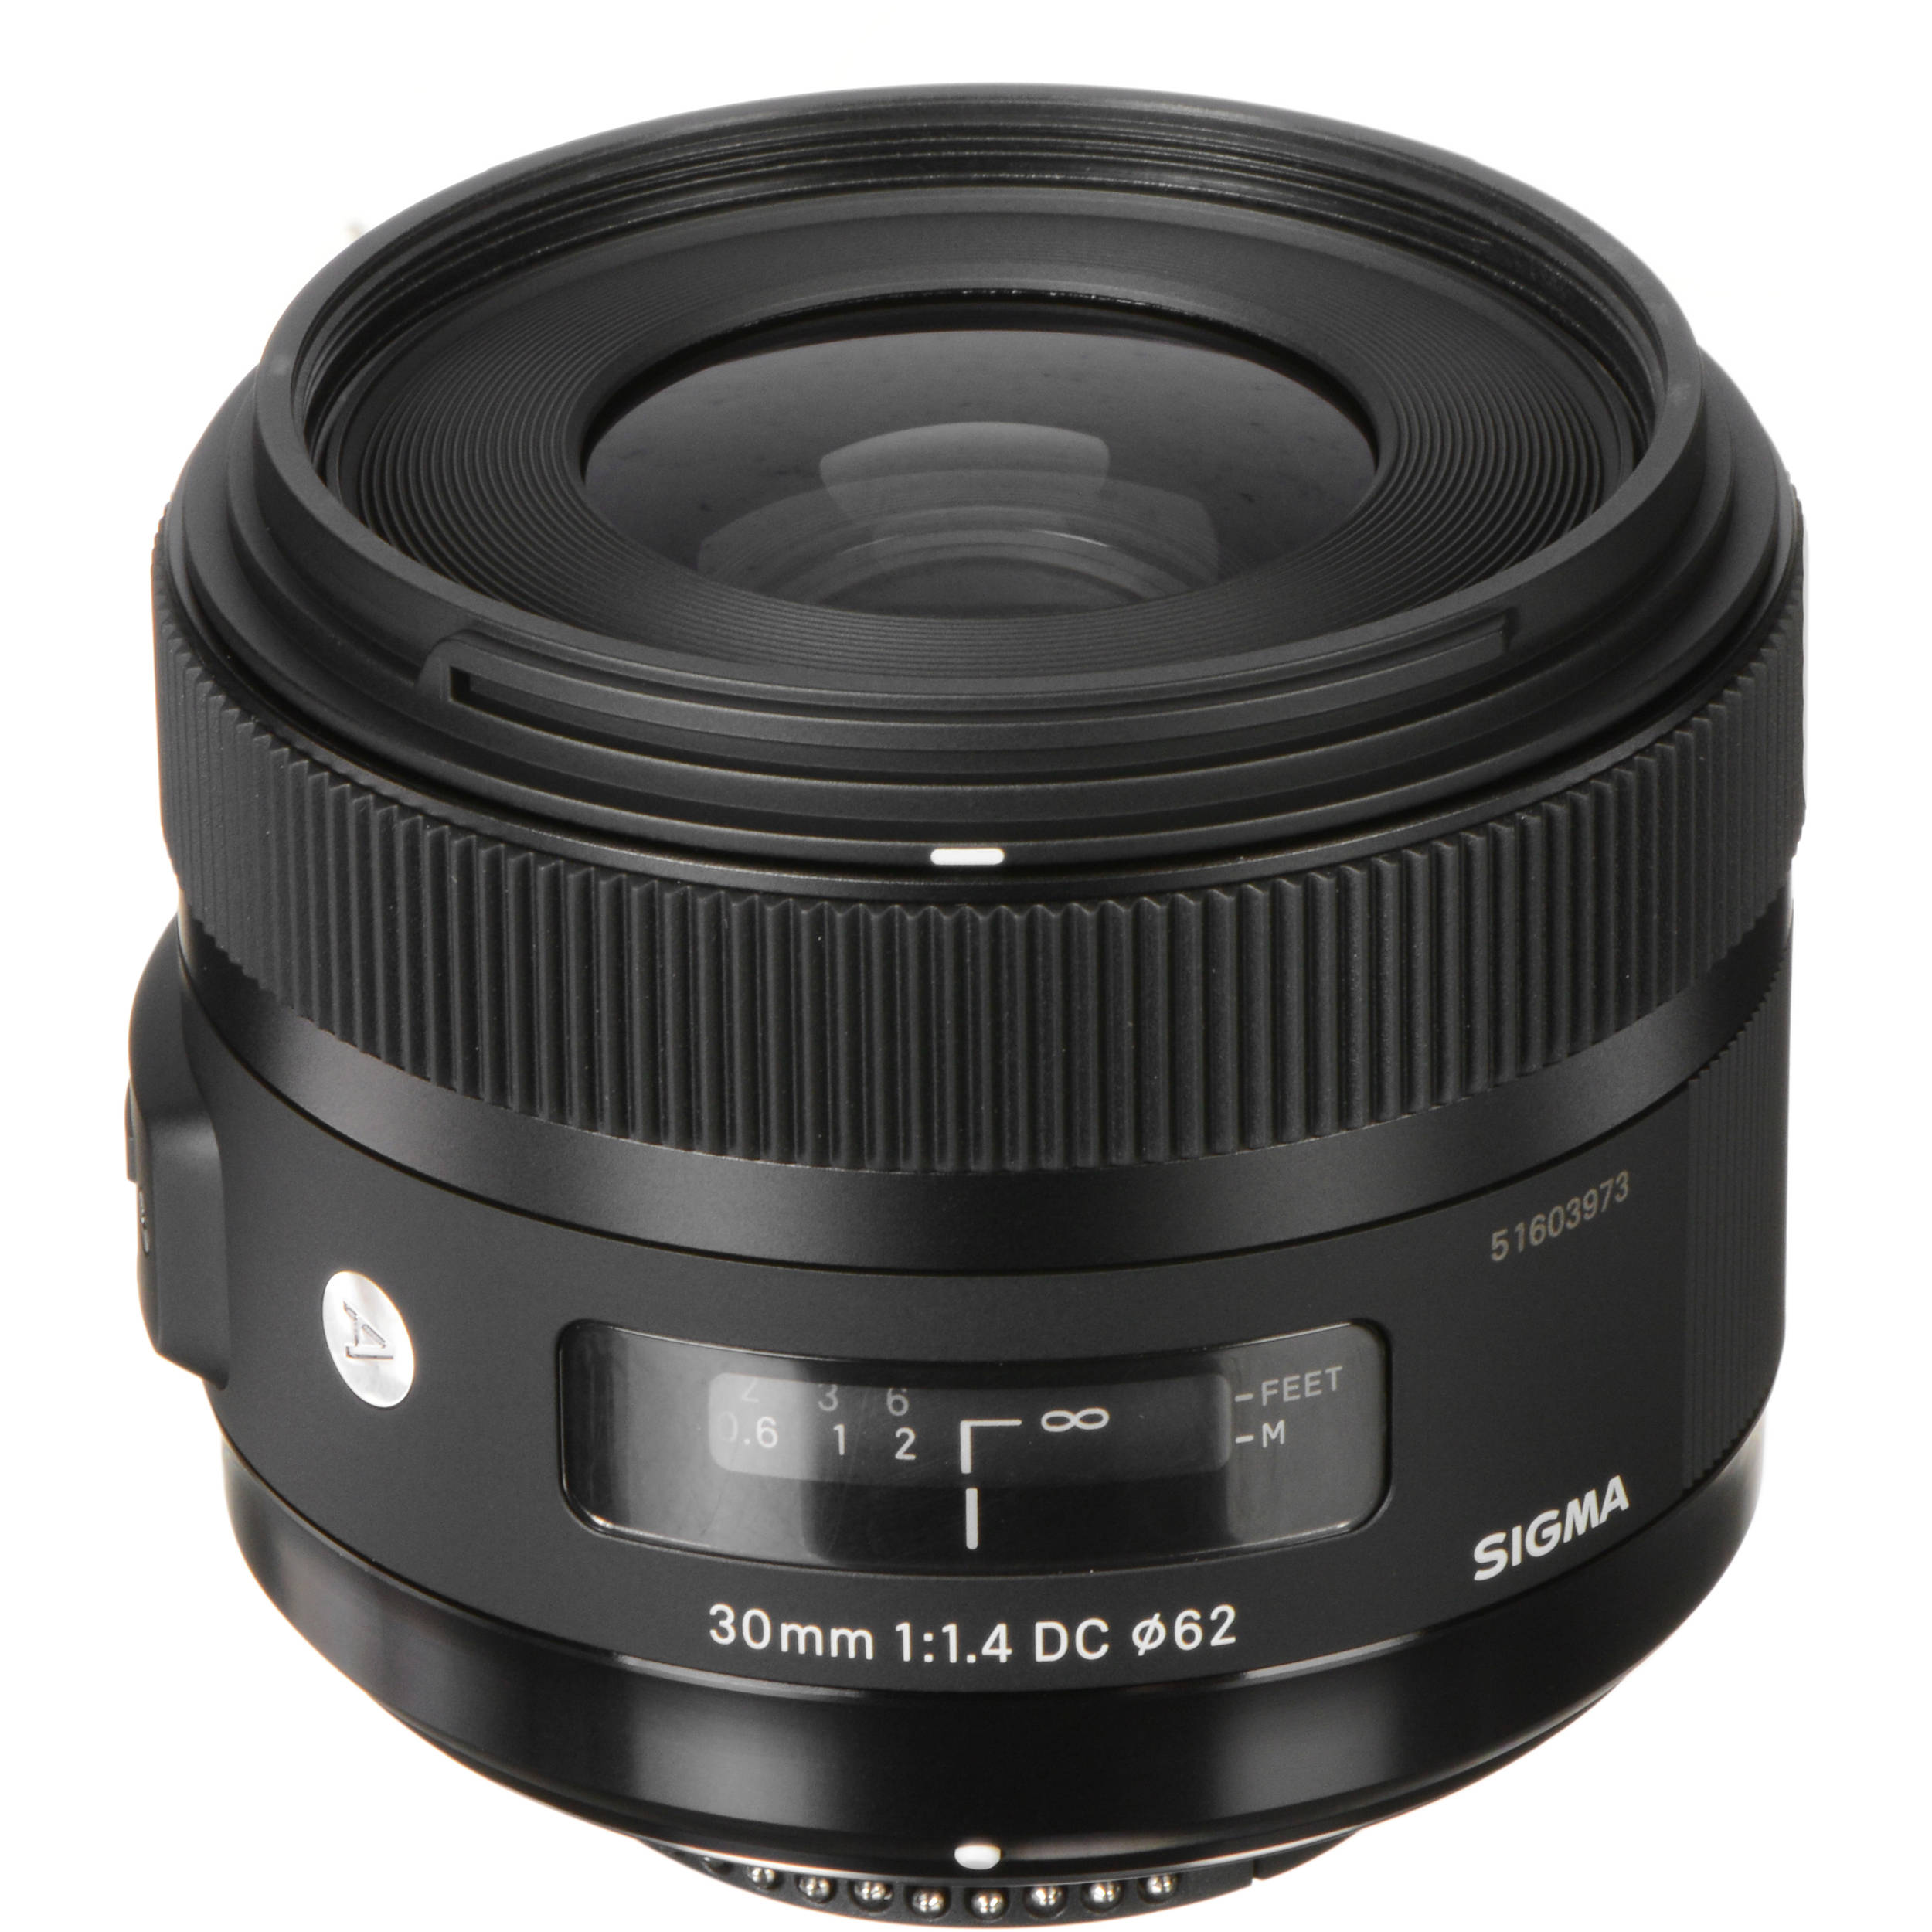 Sigma 30mm f/1 4 DC HSM Art Lens for Nikon F